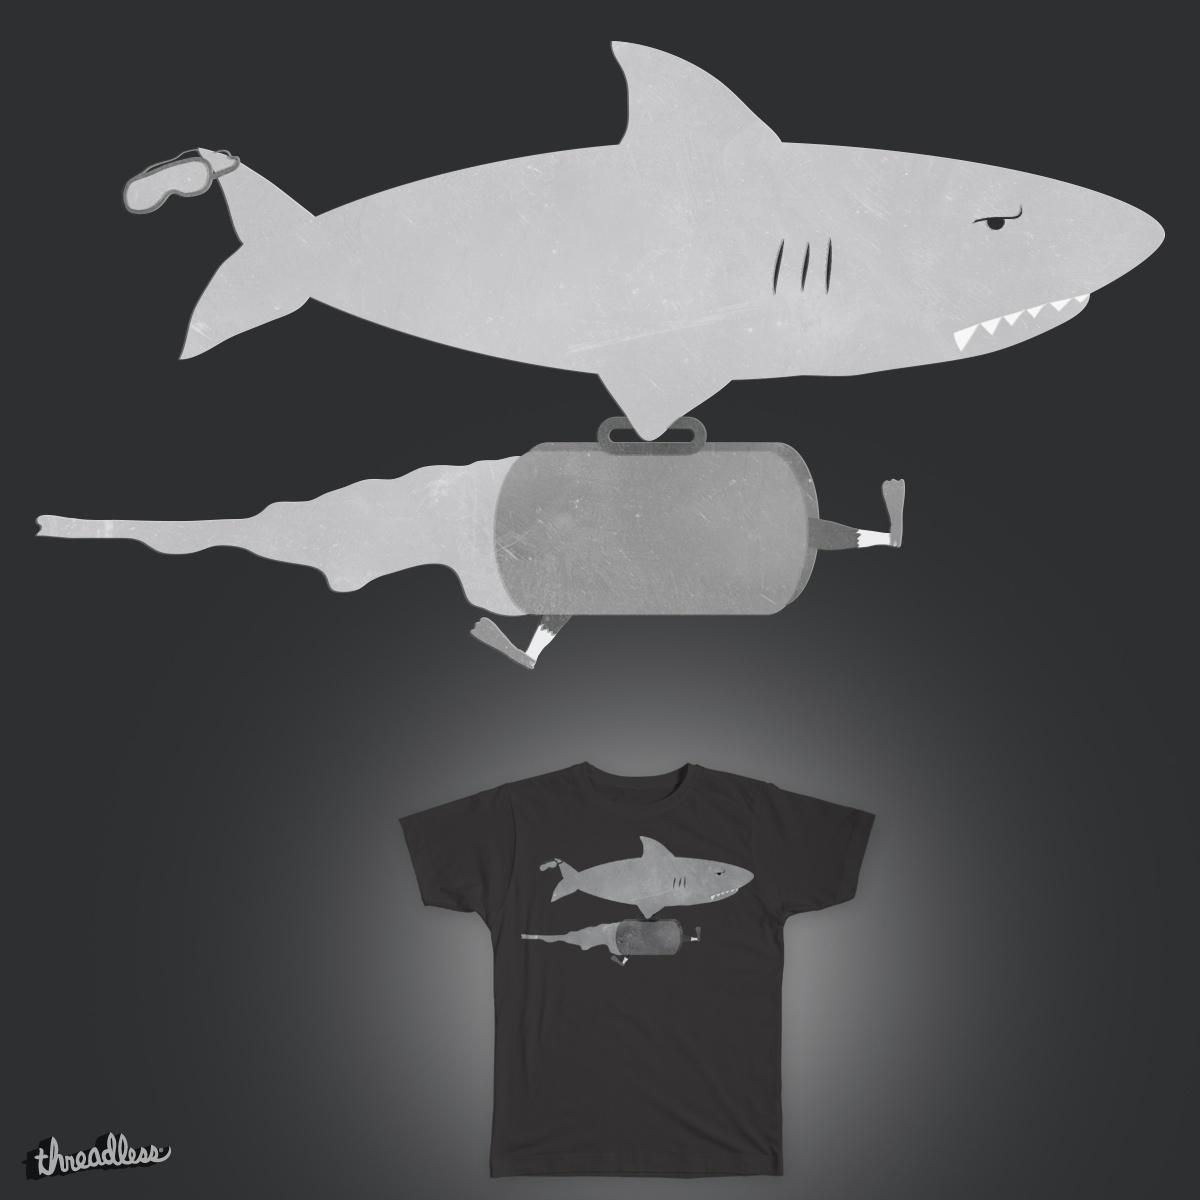 Shark Week - Monday by Jacko_Monster on Threadless